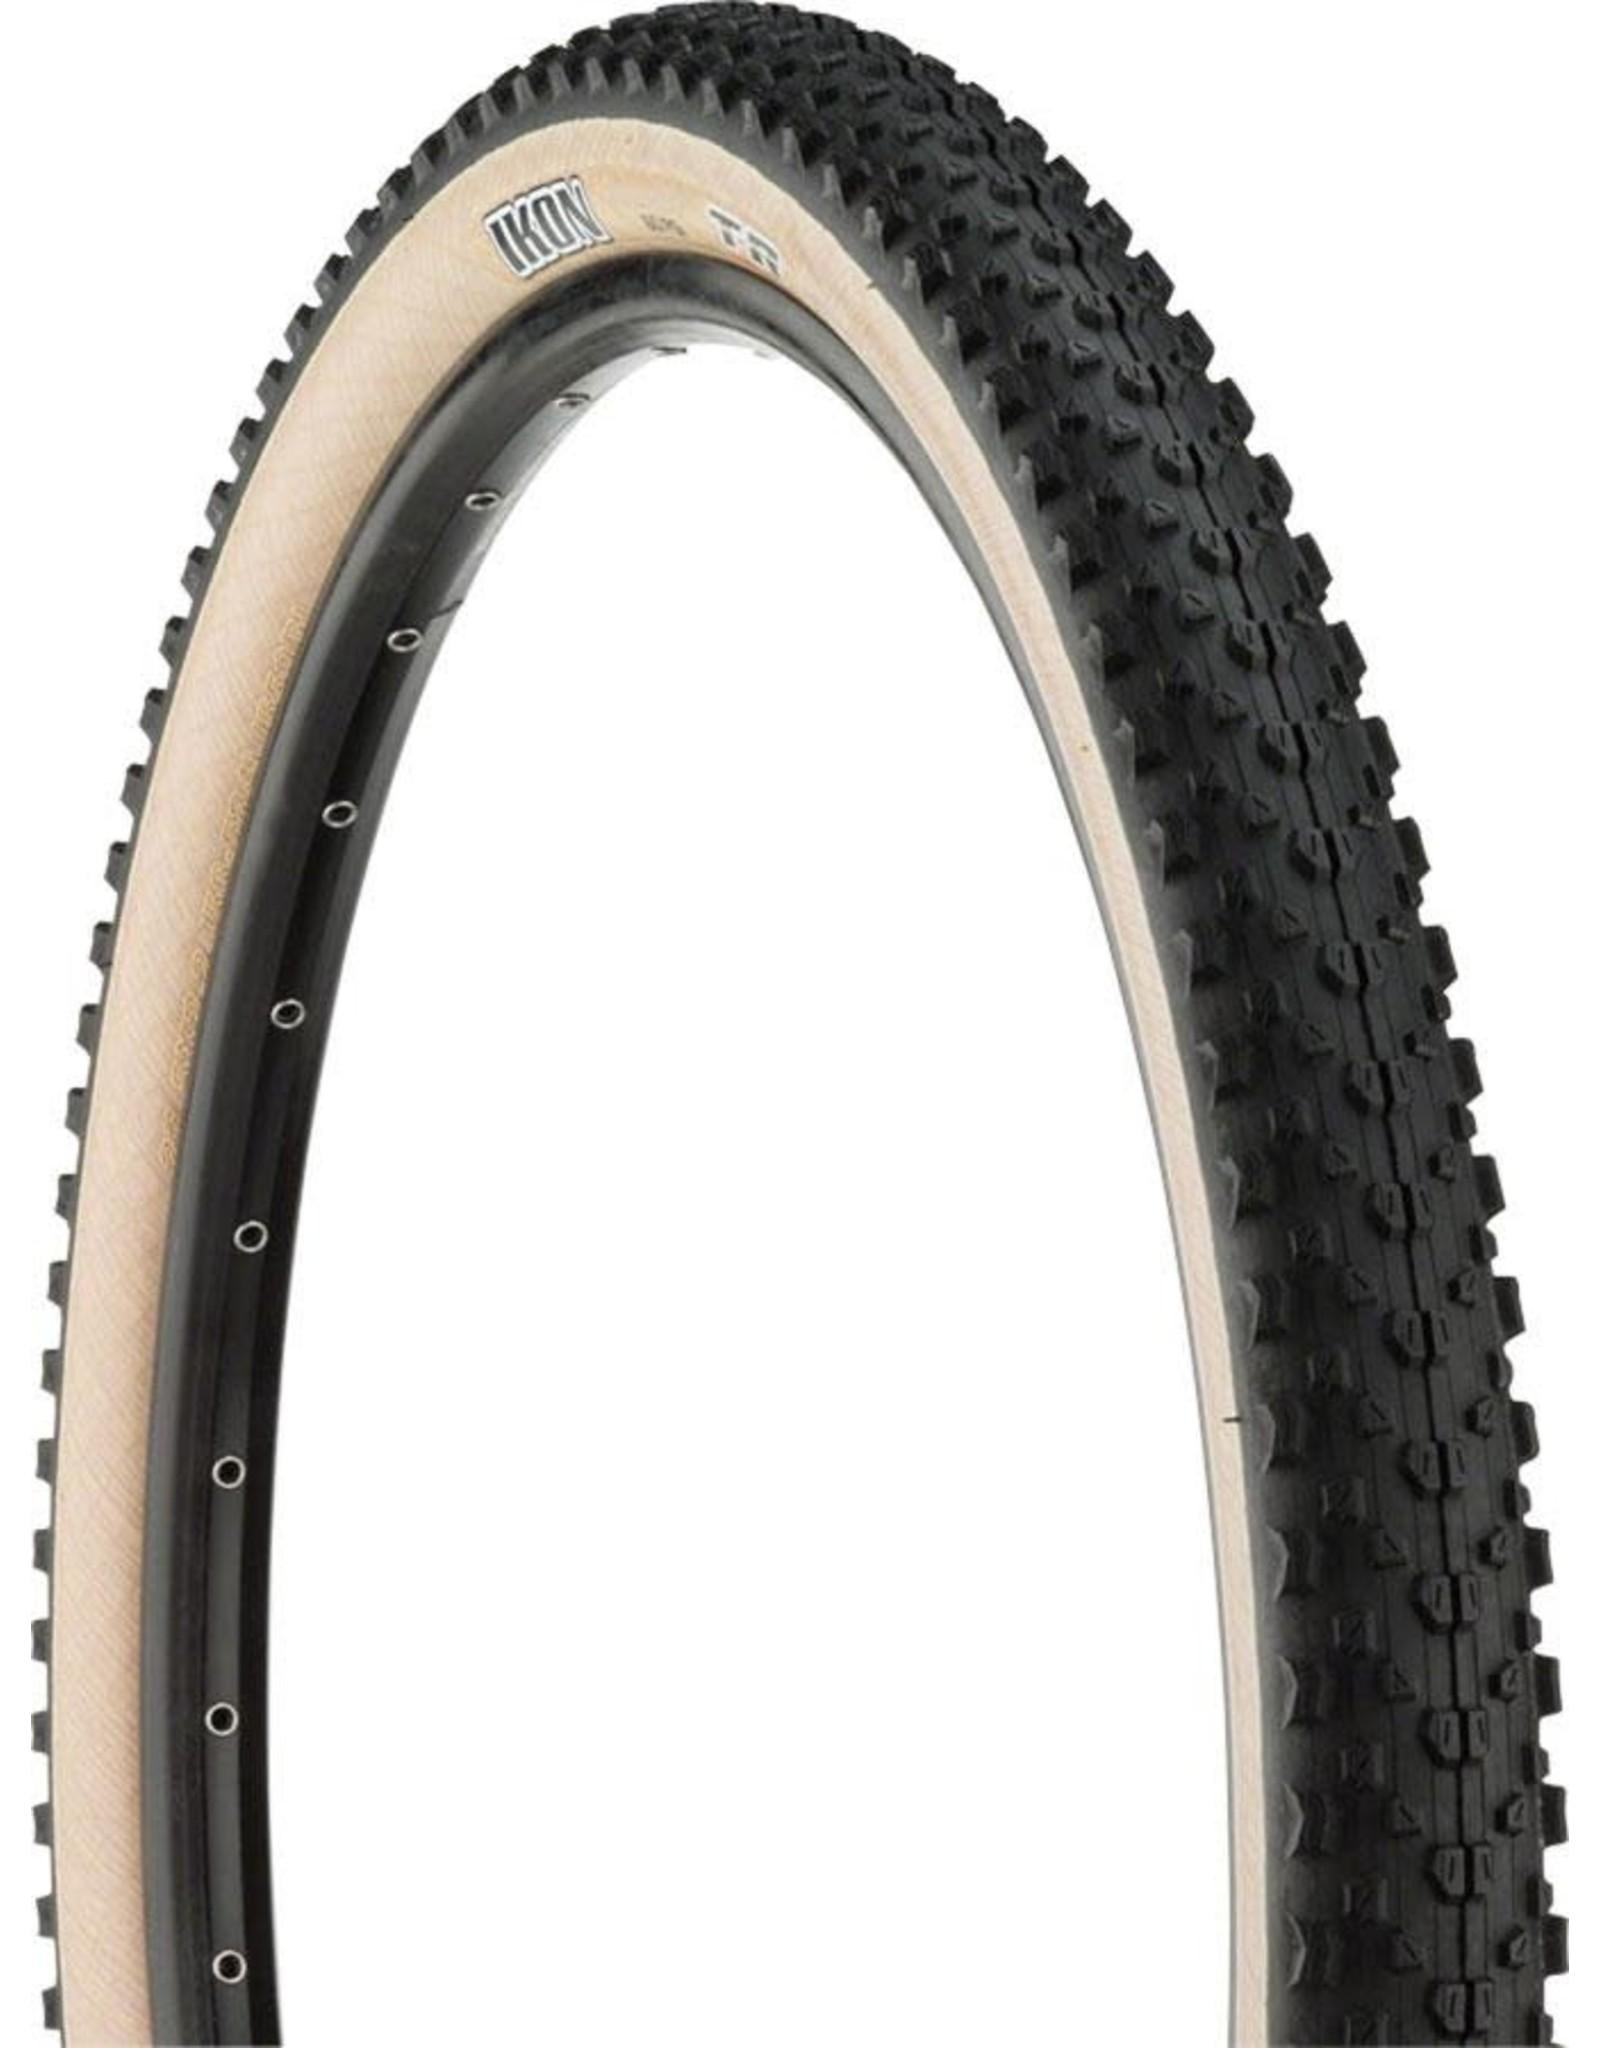 Maxxis Maxxis - Ikon Tire - 27.5 x 2.2, Tubeless, Folding, Black/Light Tan, Dual, EXO